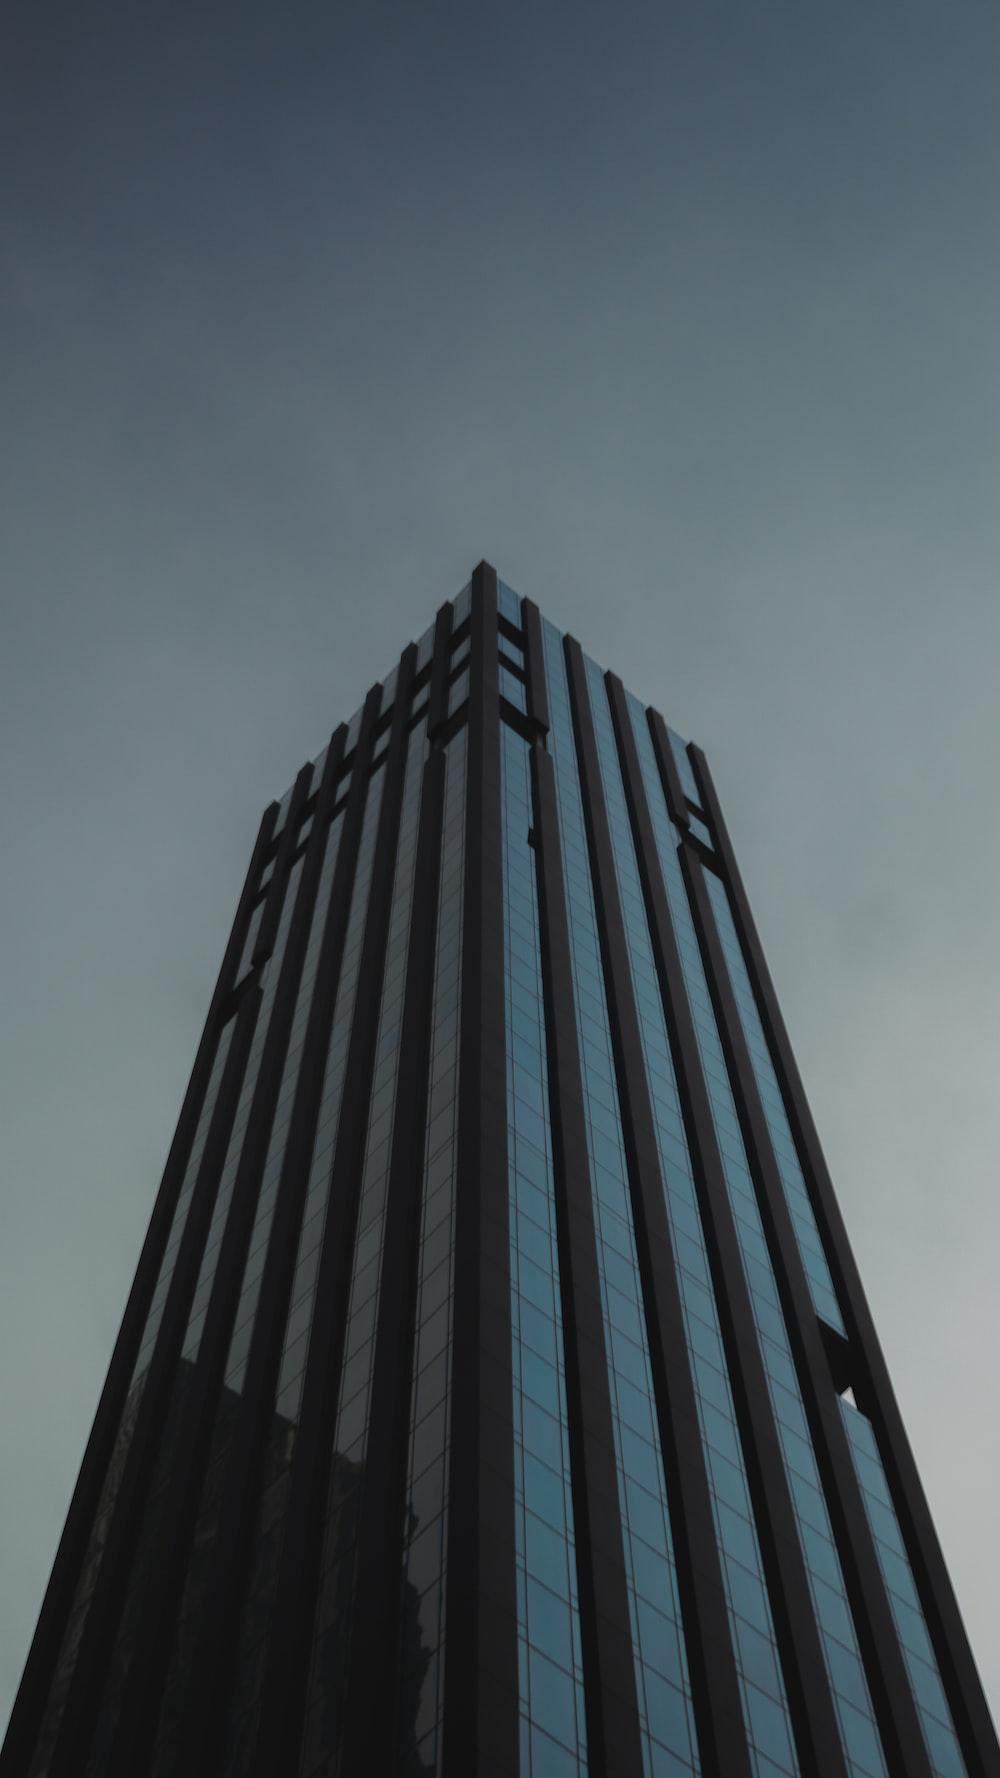 black high rise building under white sky